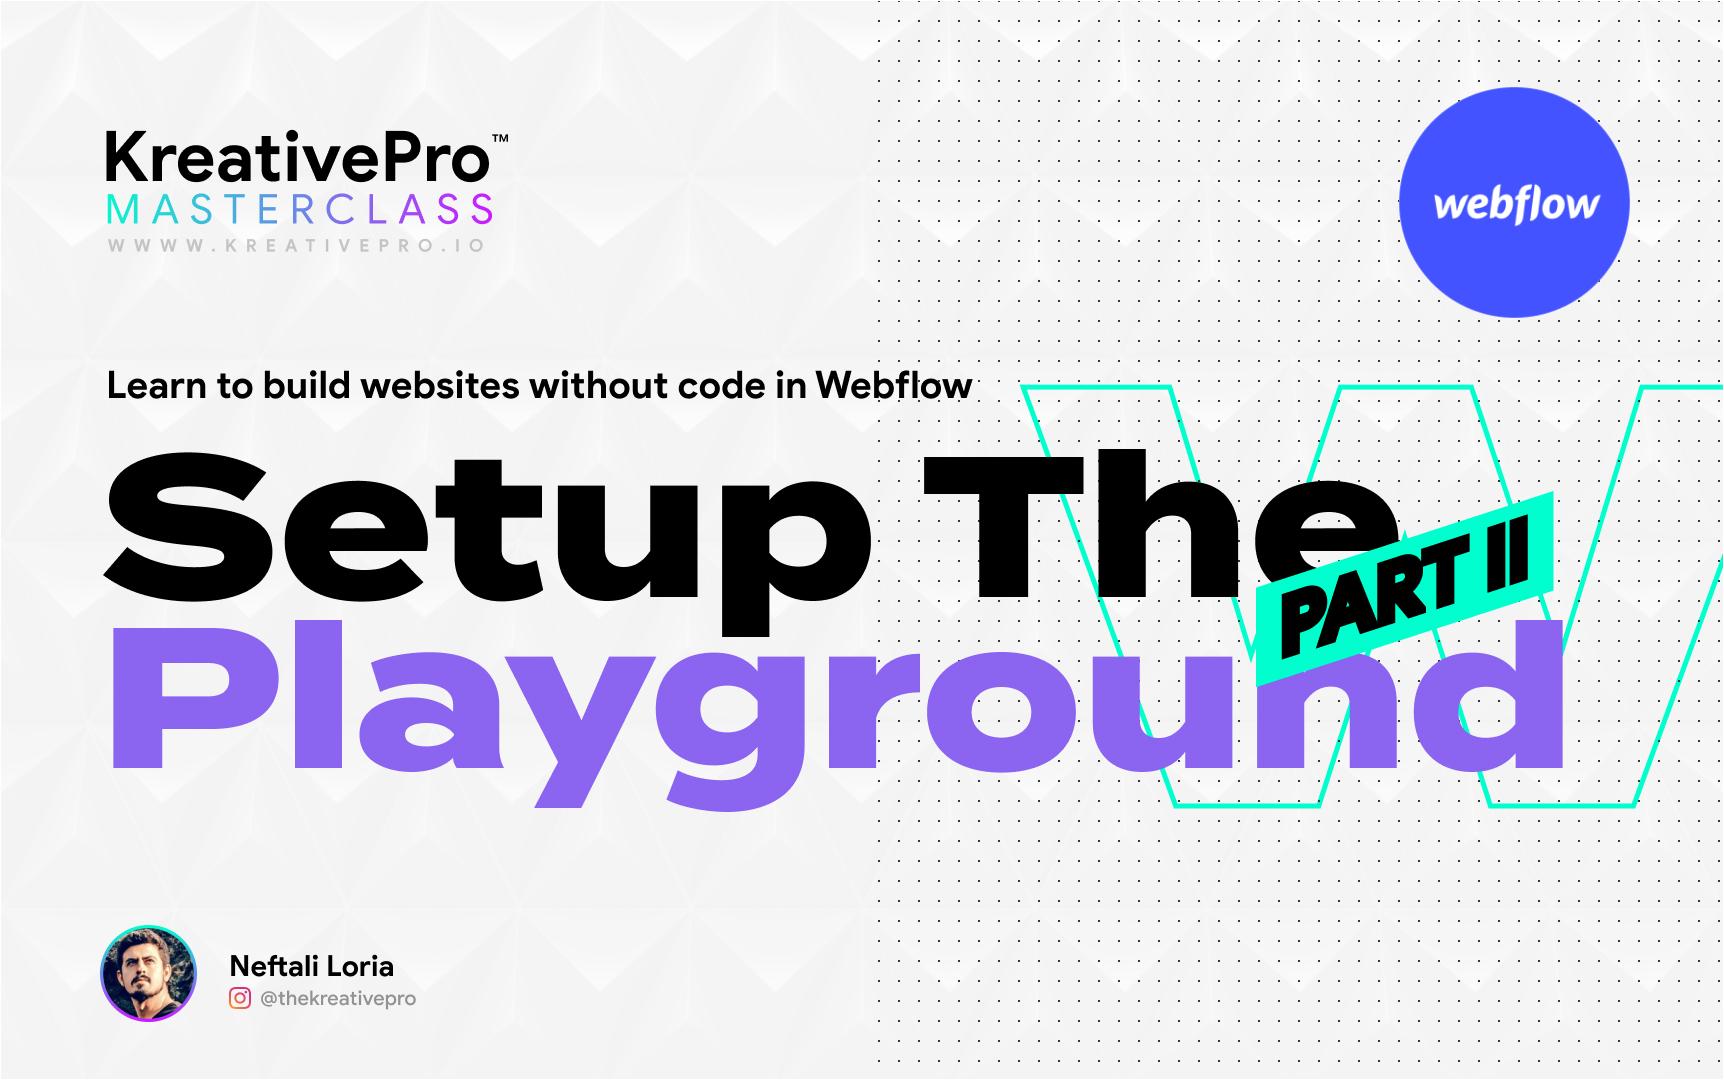 Webflow 2.8 - Playground Part II